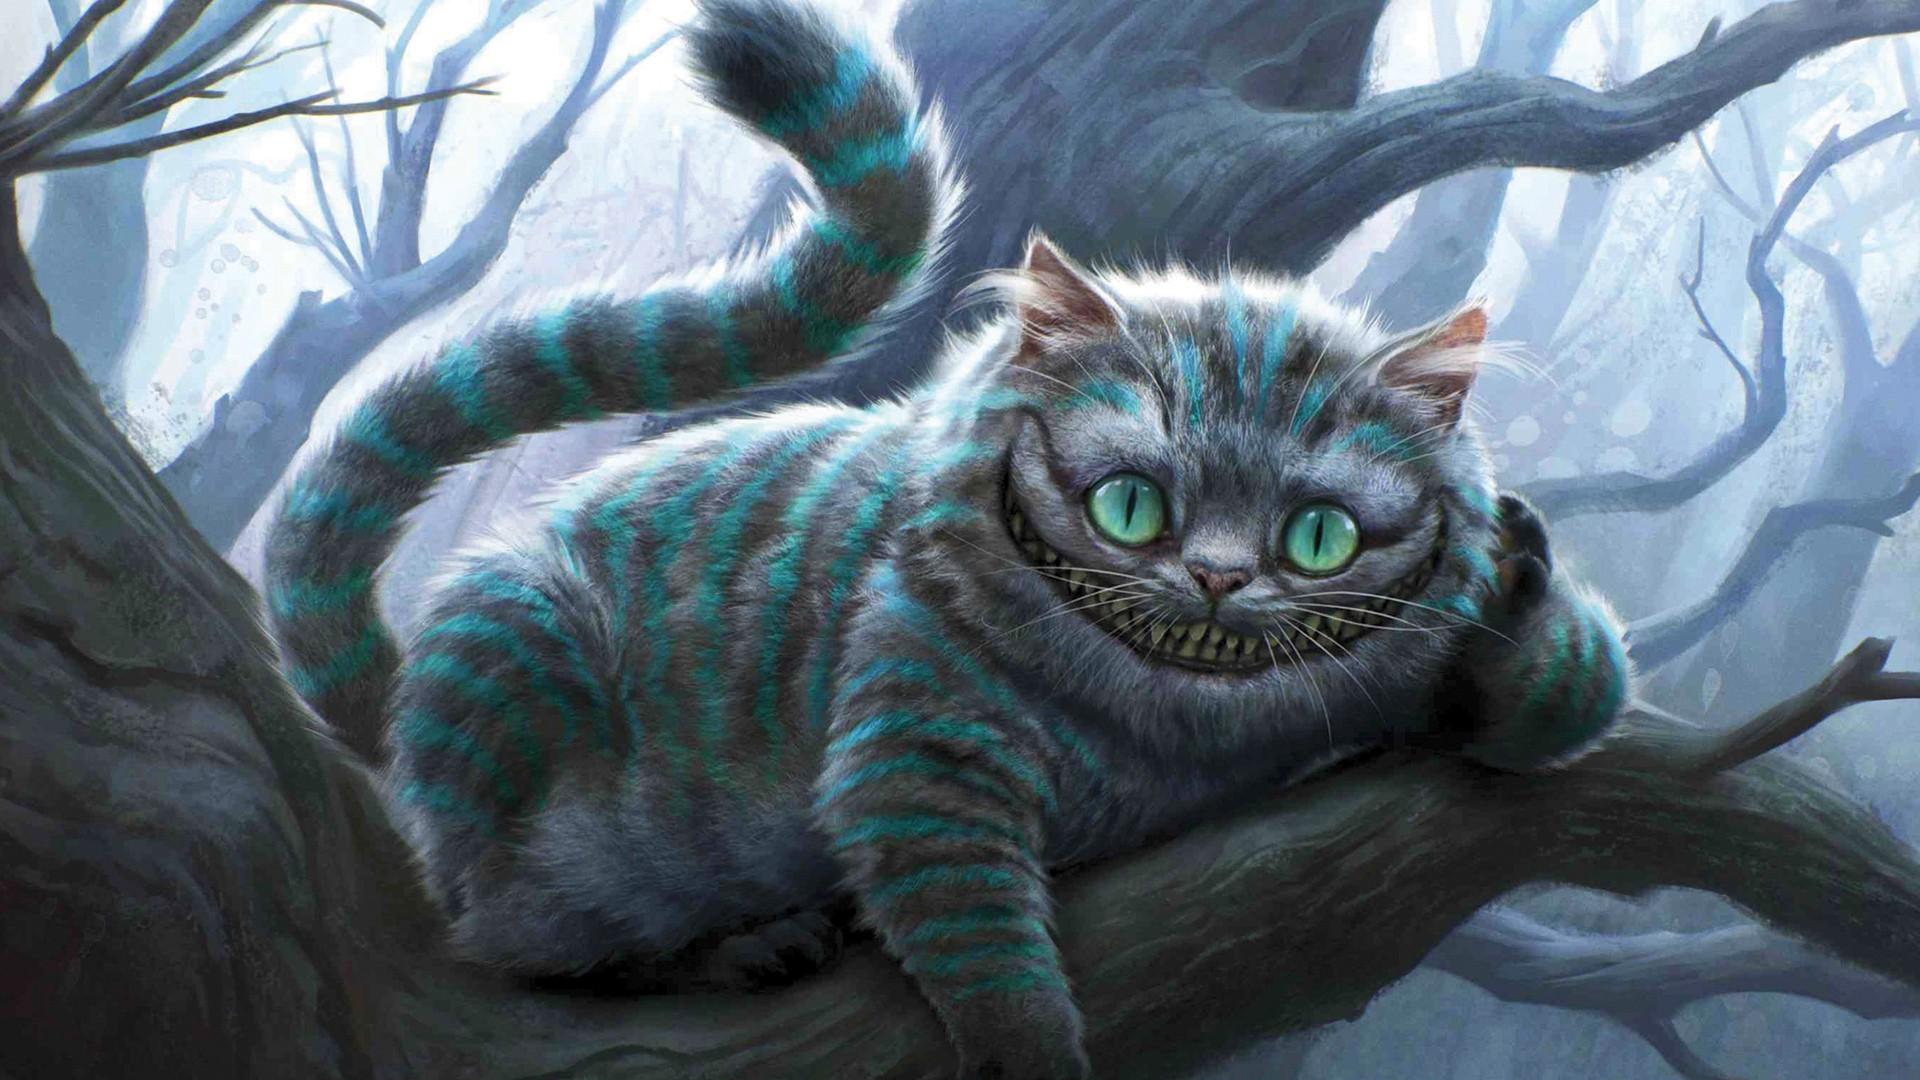 … x 1080 Original. Description: Download Cheshire Cat Movies wallpaper …